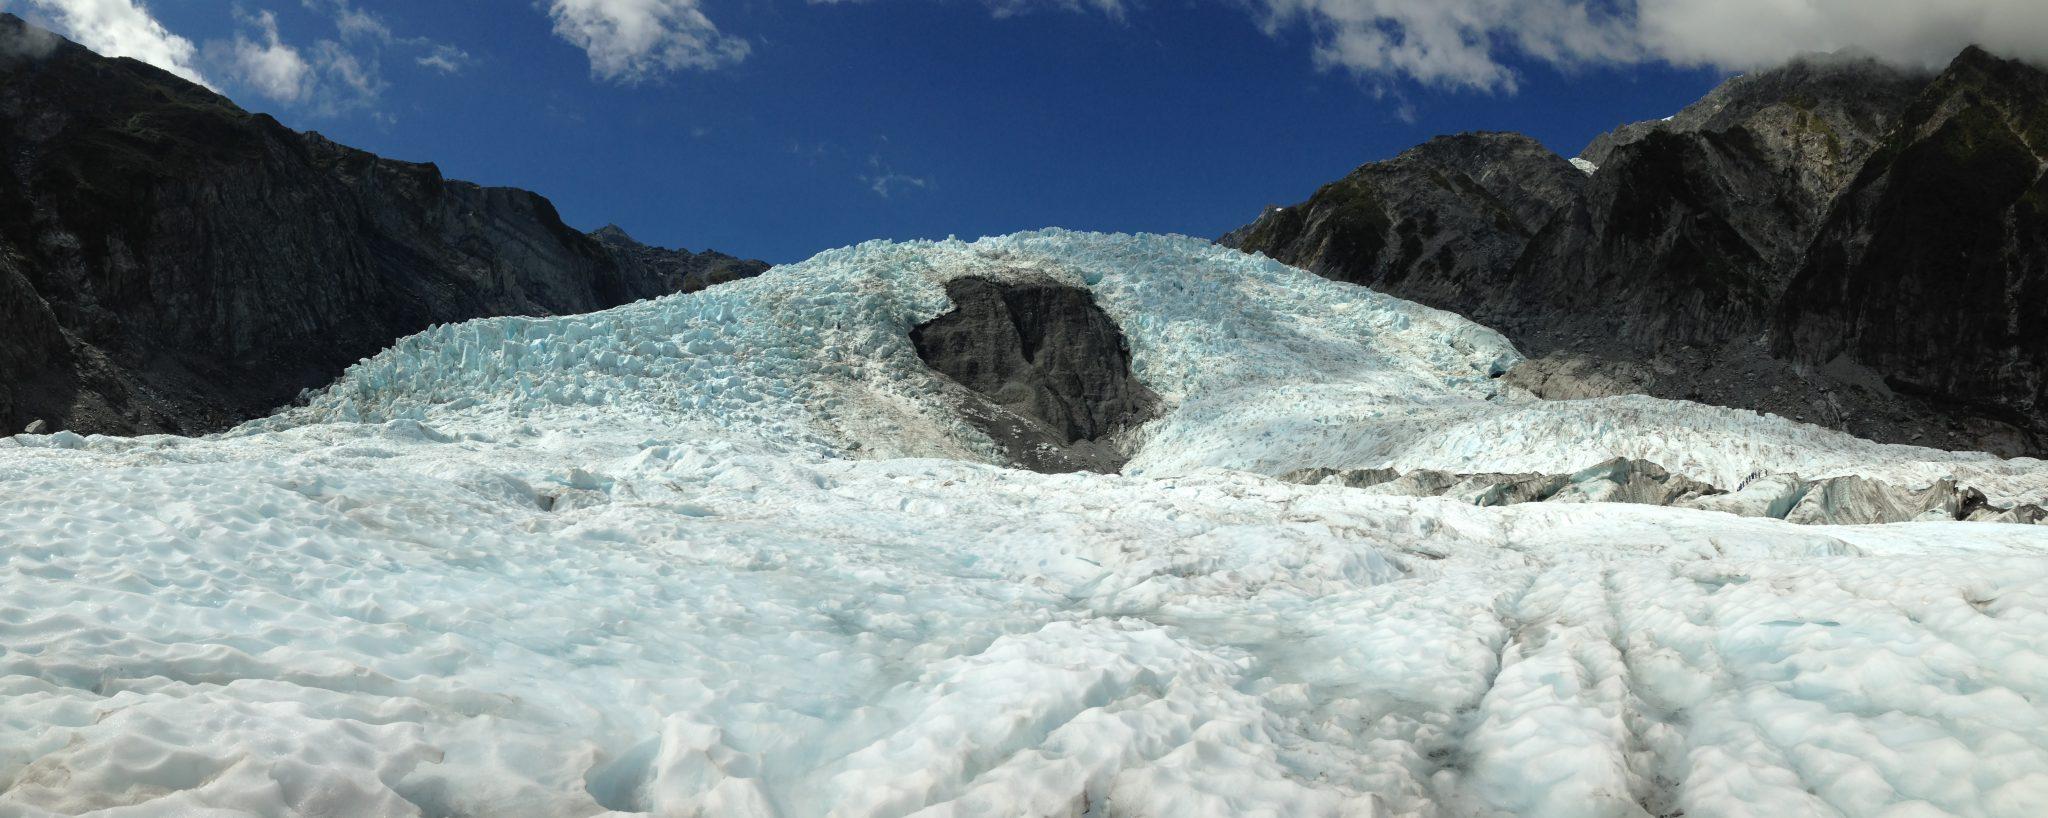 Franz Joseph Glacier Jan 2018